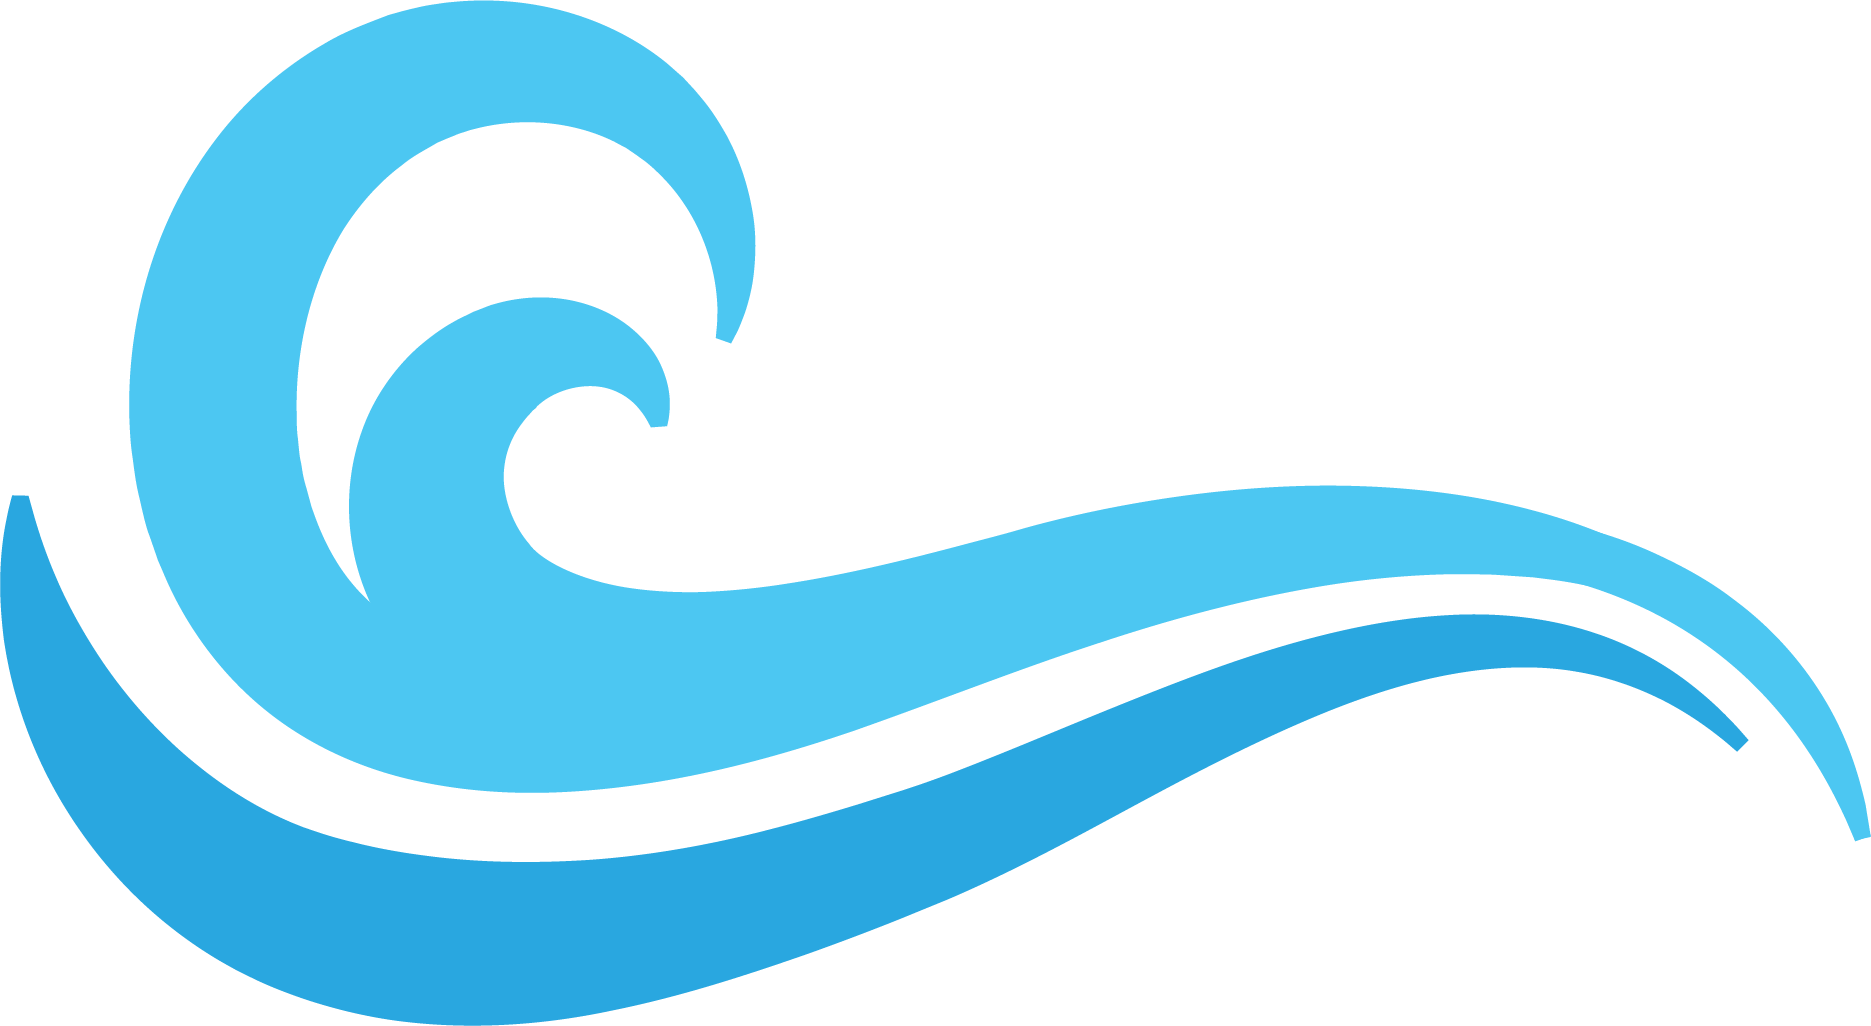 Waves clipart olas. Logo blue wind wave